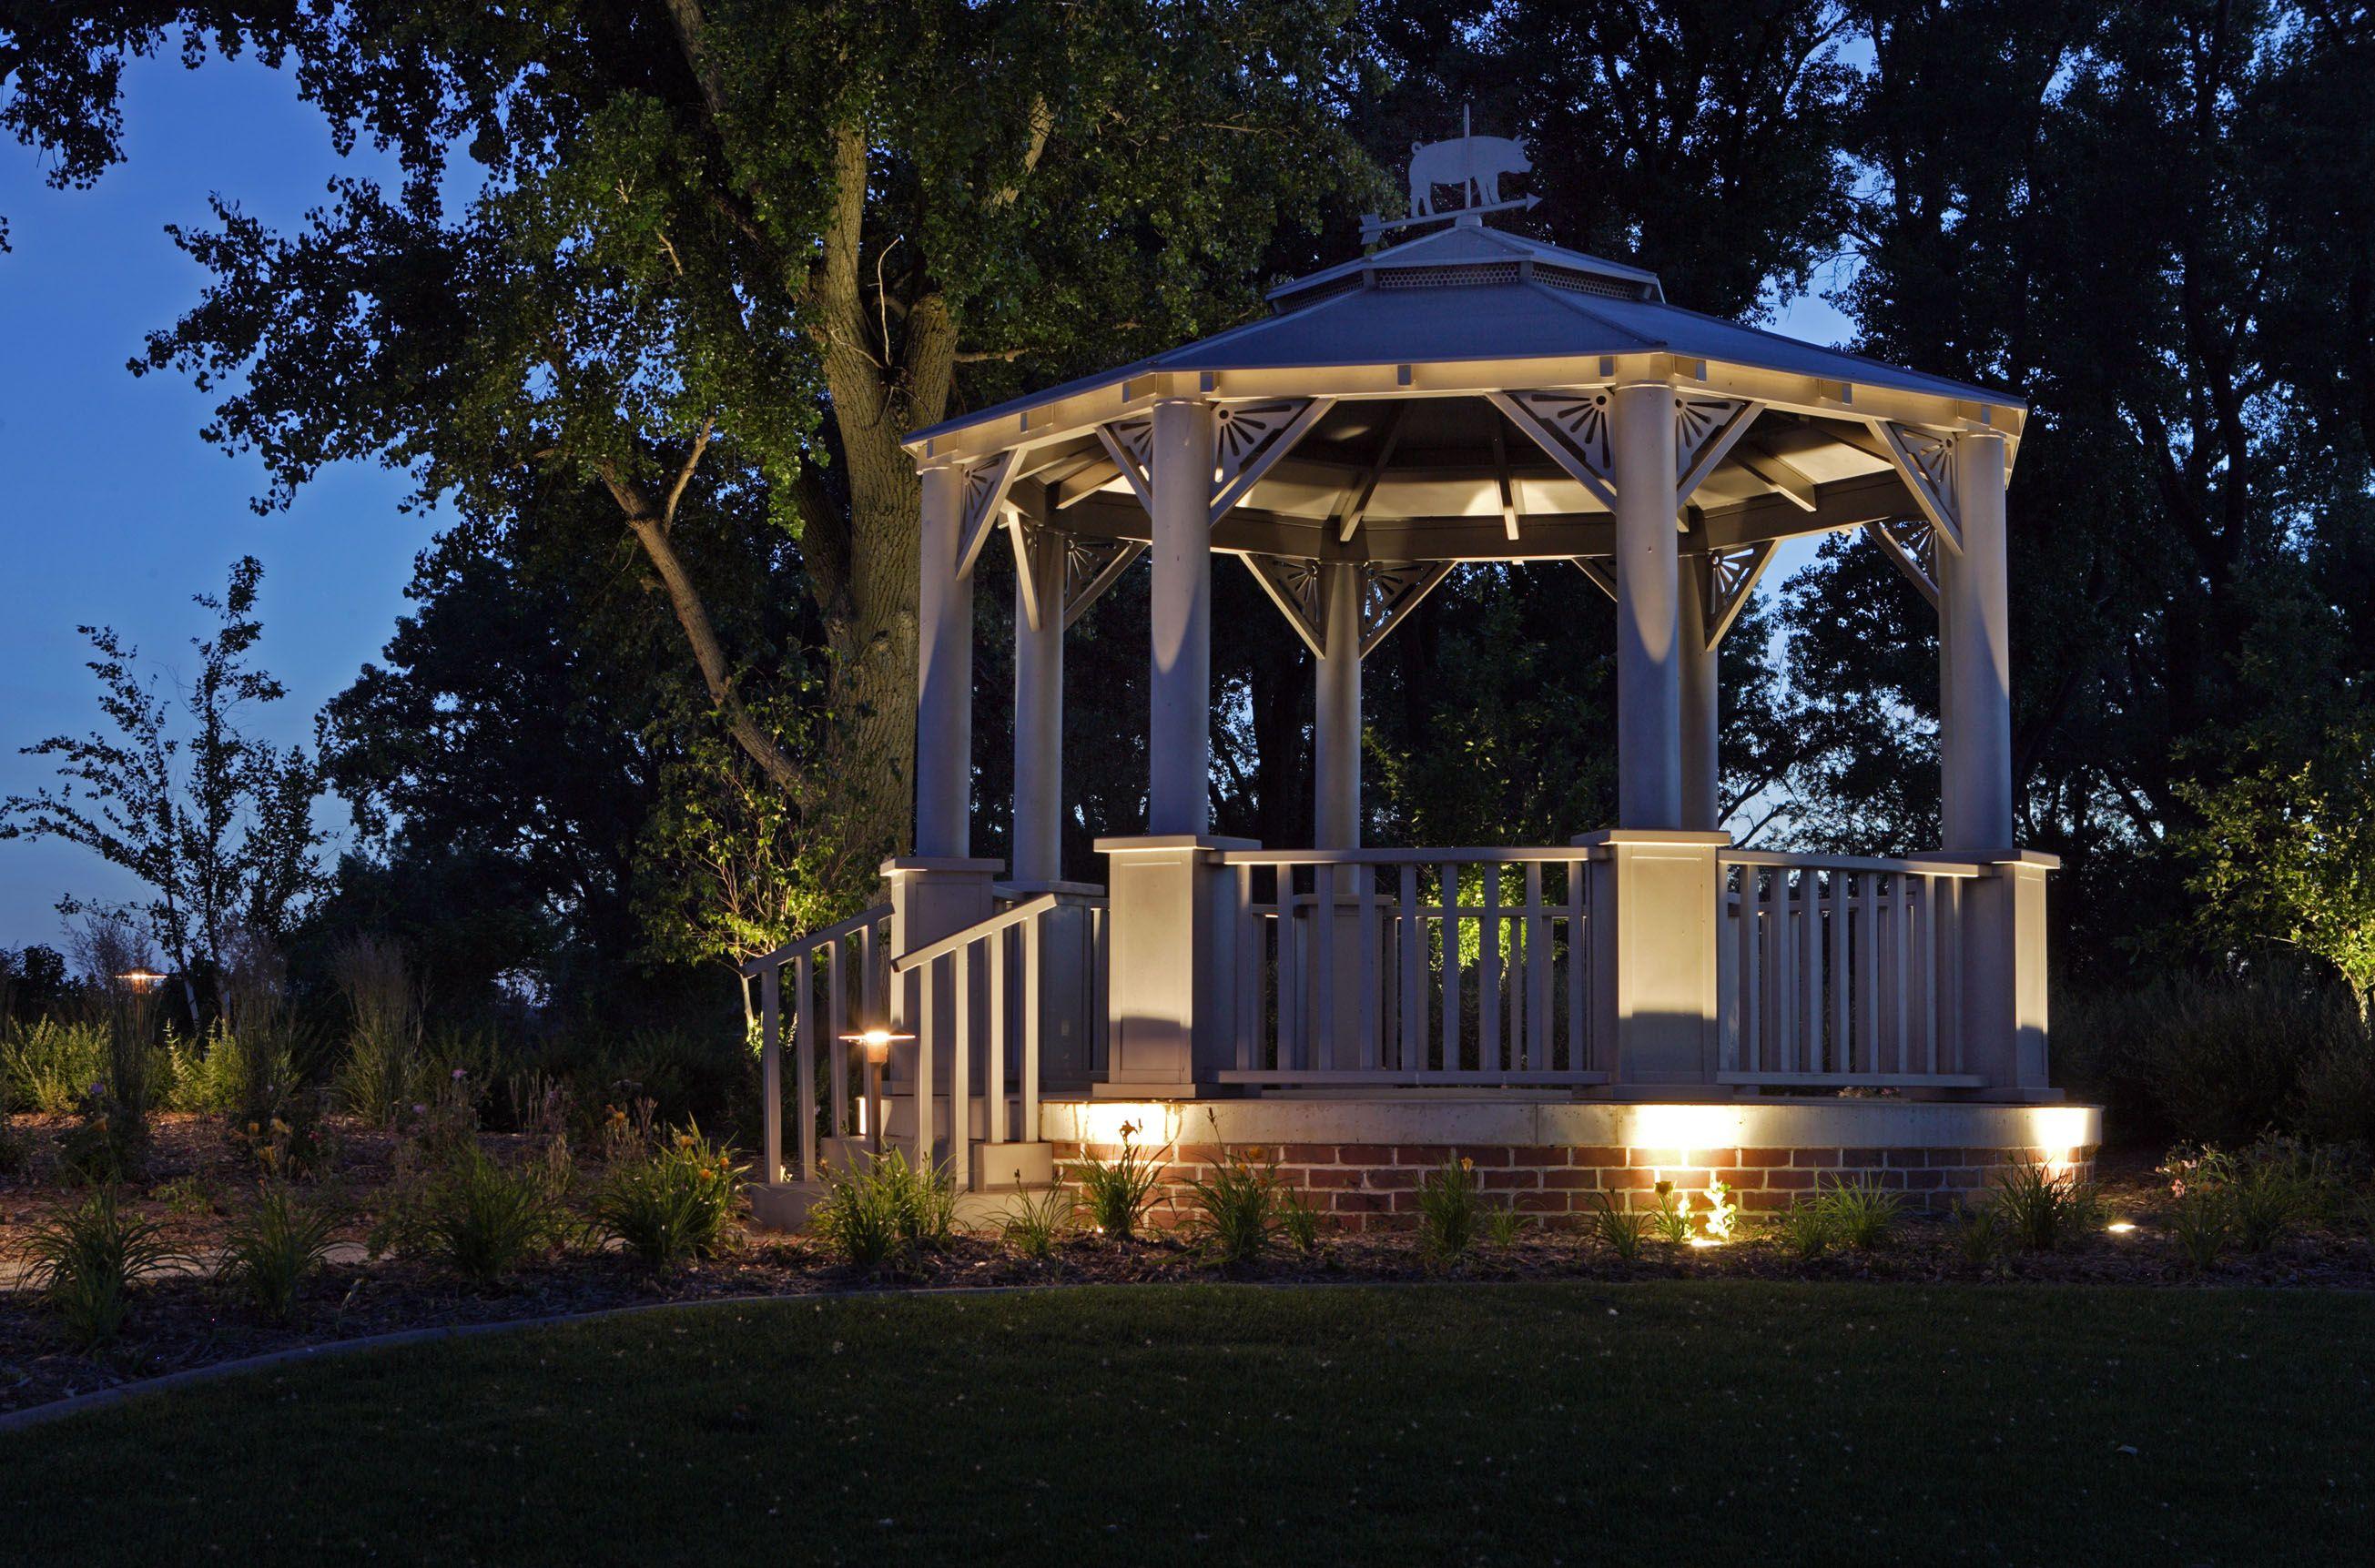 Specialty Lighting Outdoor Gazebos Gazebo Lighting Landscape Lighting